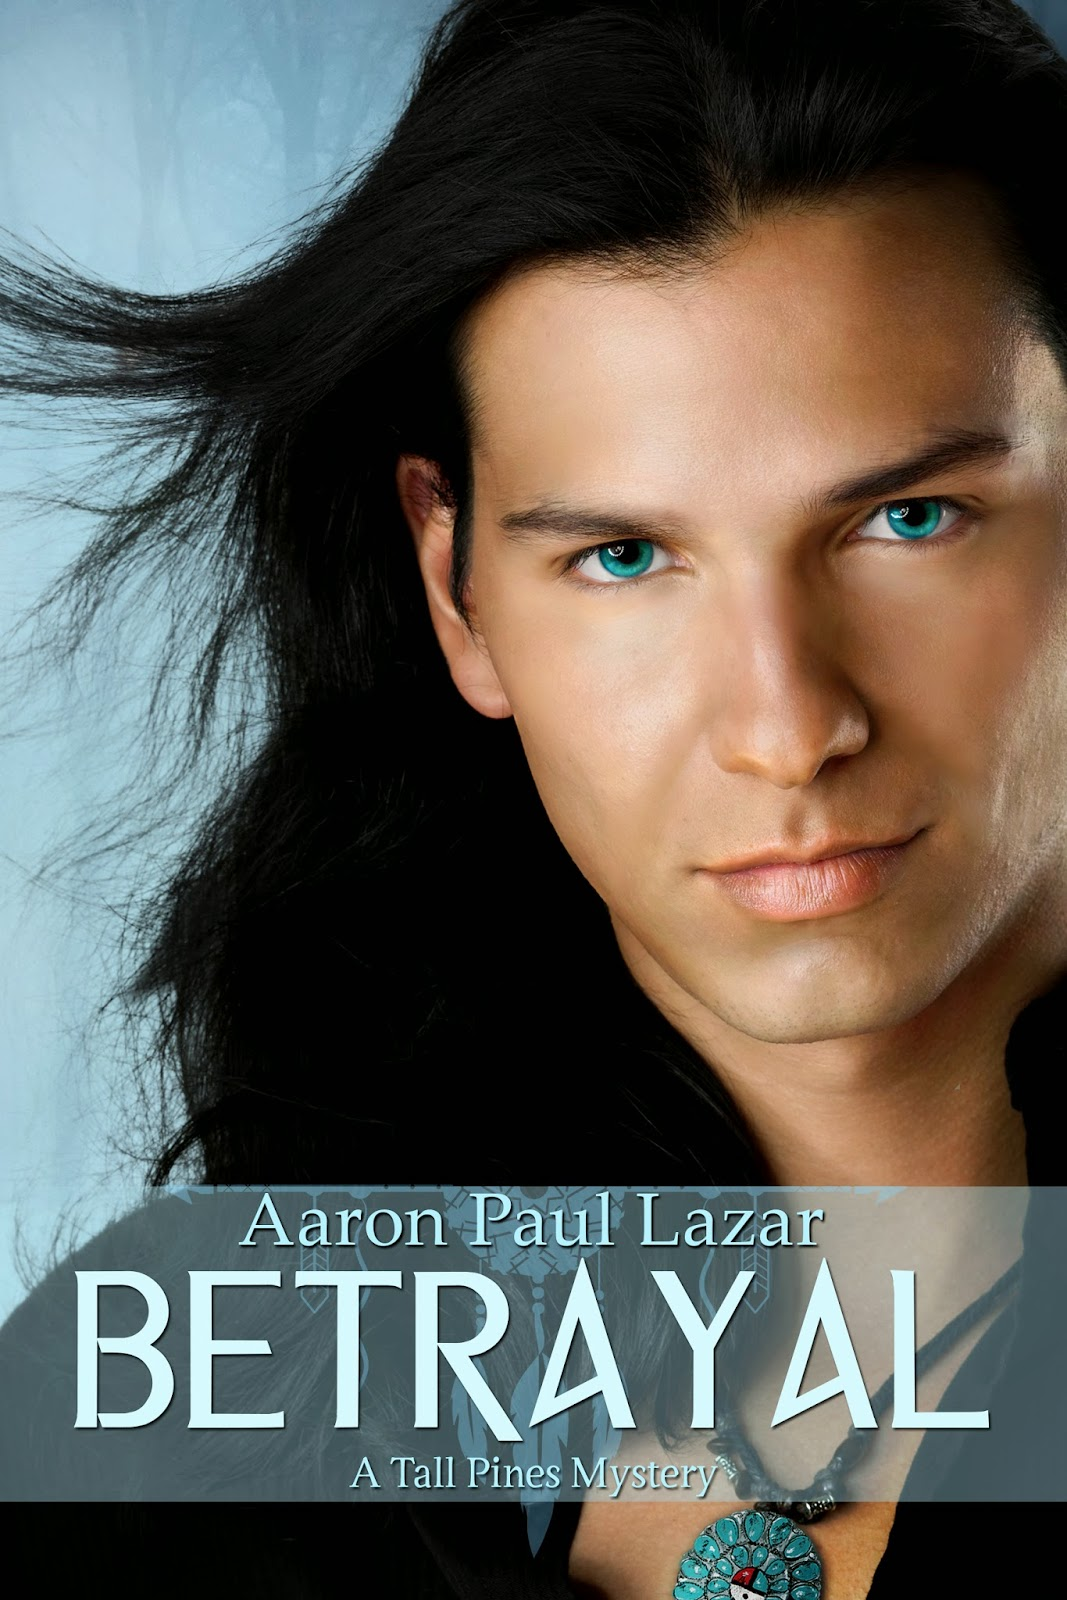 http://www.amazon.com/Betrayal-Tall-Pines-Mystery-Mysteries-ebook/dp/B00N2134W0/ref=pd_sim_kstore_1?ie=UTF8&refRID=0Y6S4QSBQ14YDT39KE39